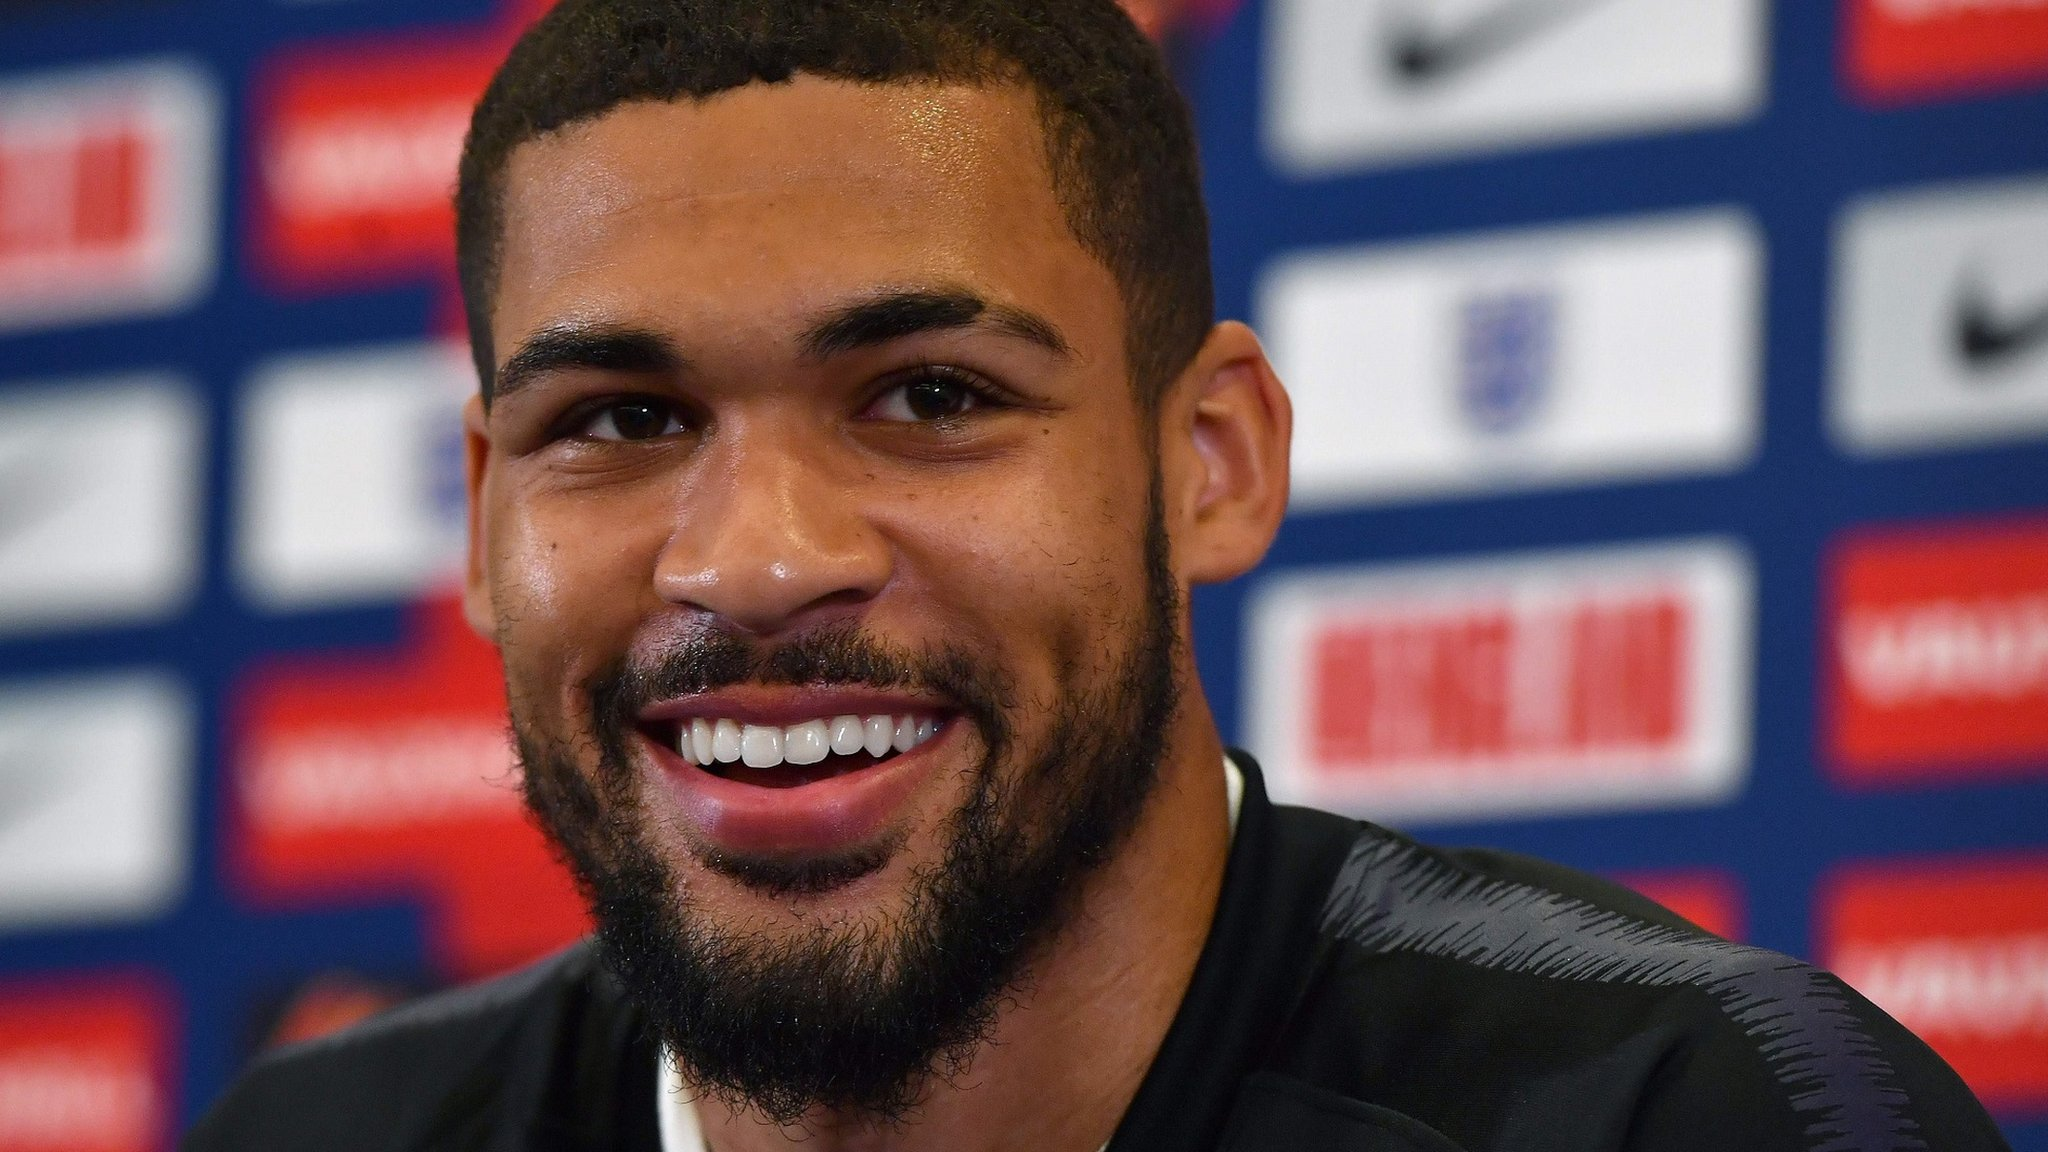 England's Loftus-Cheek 'not one to fail under pressure'